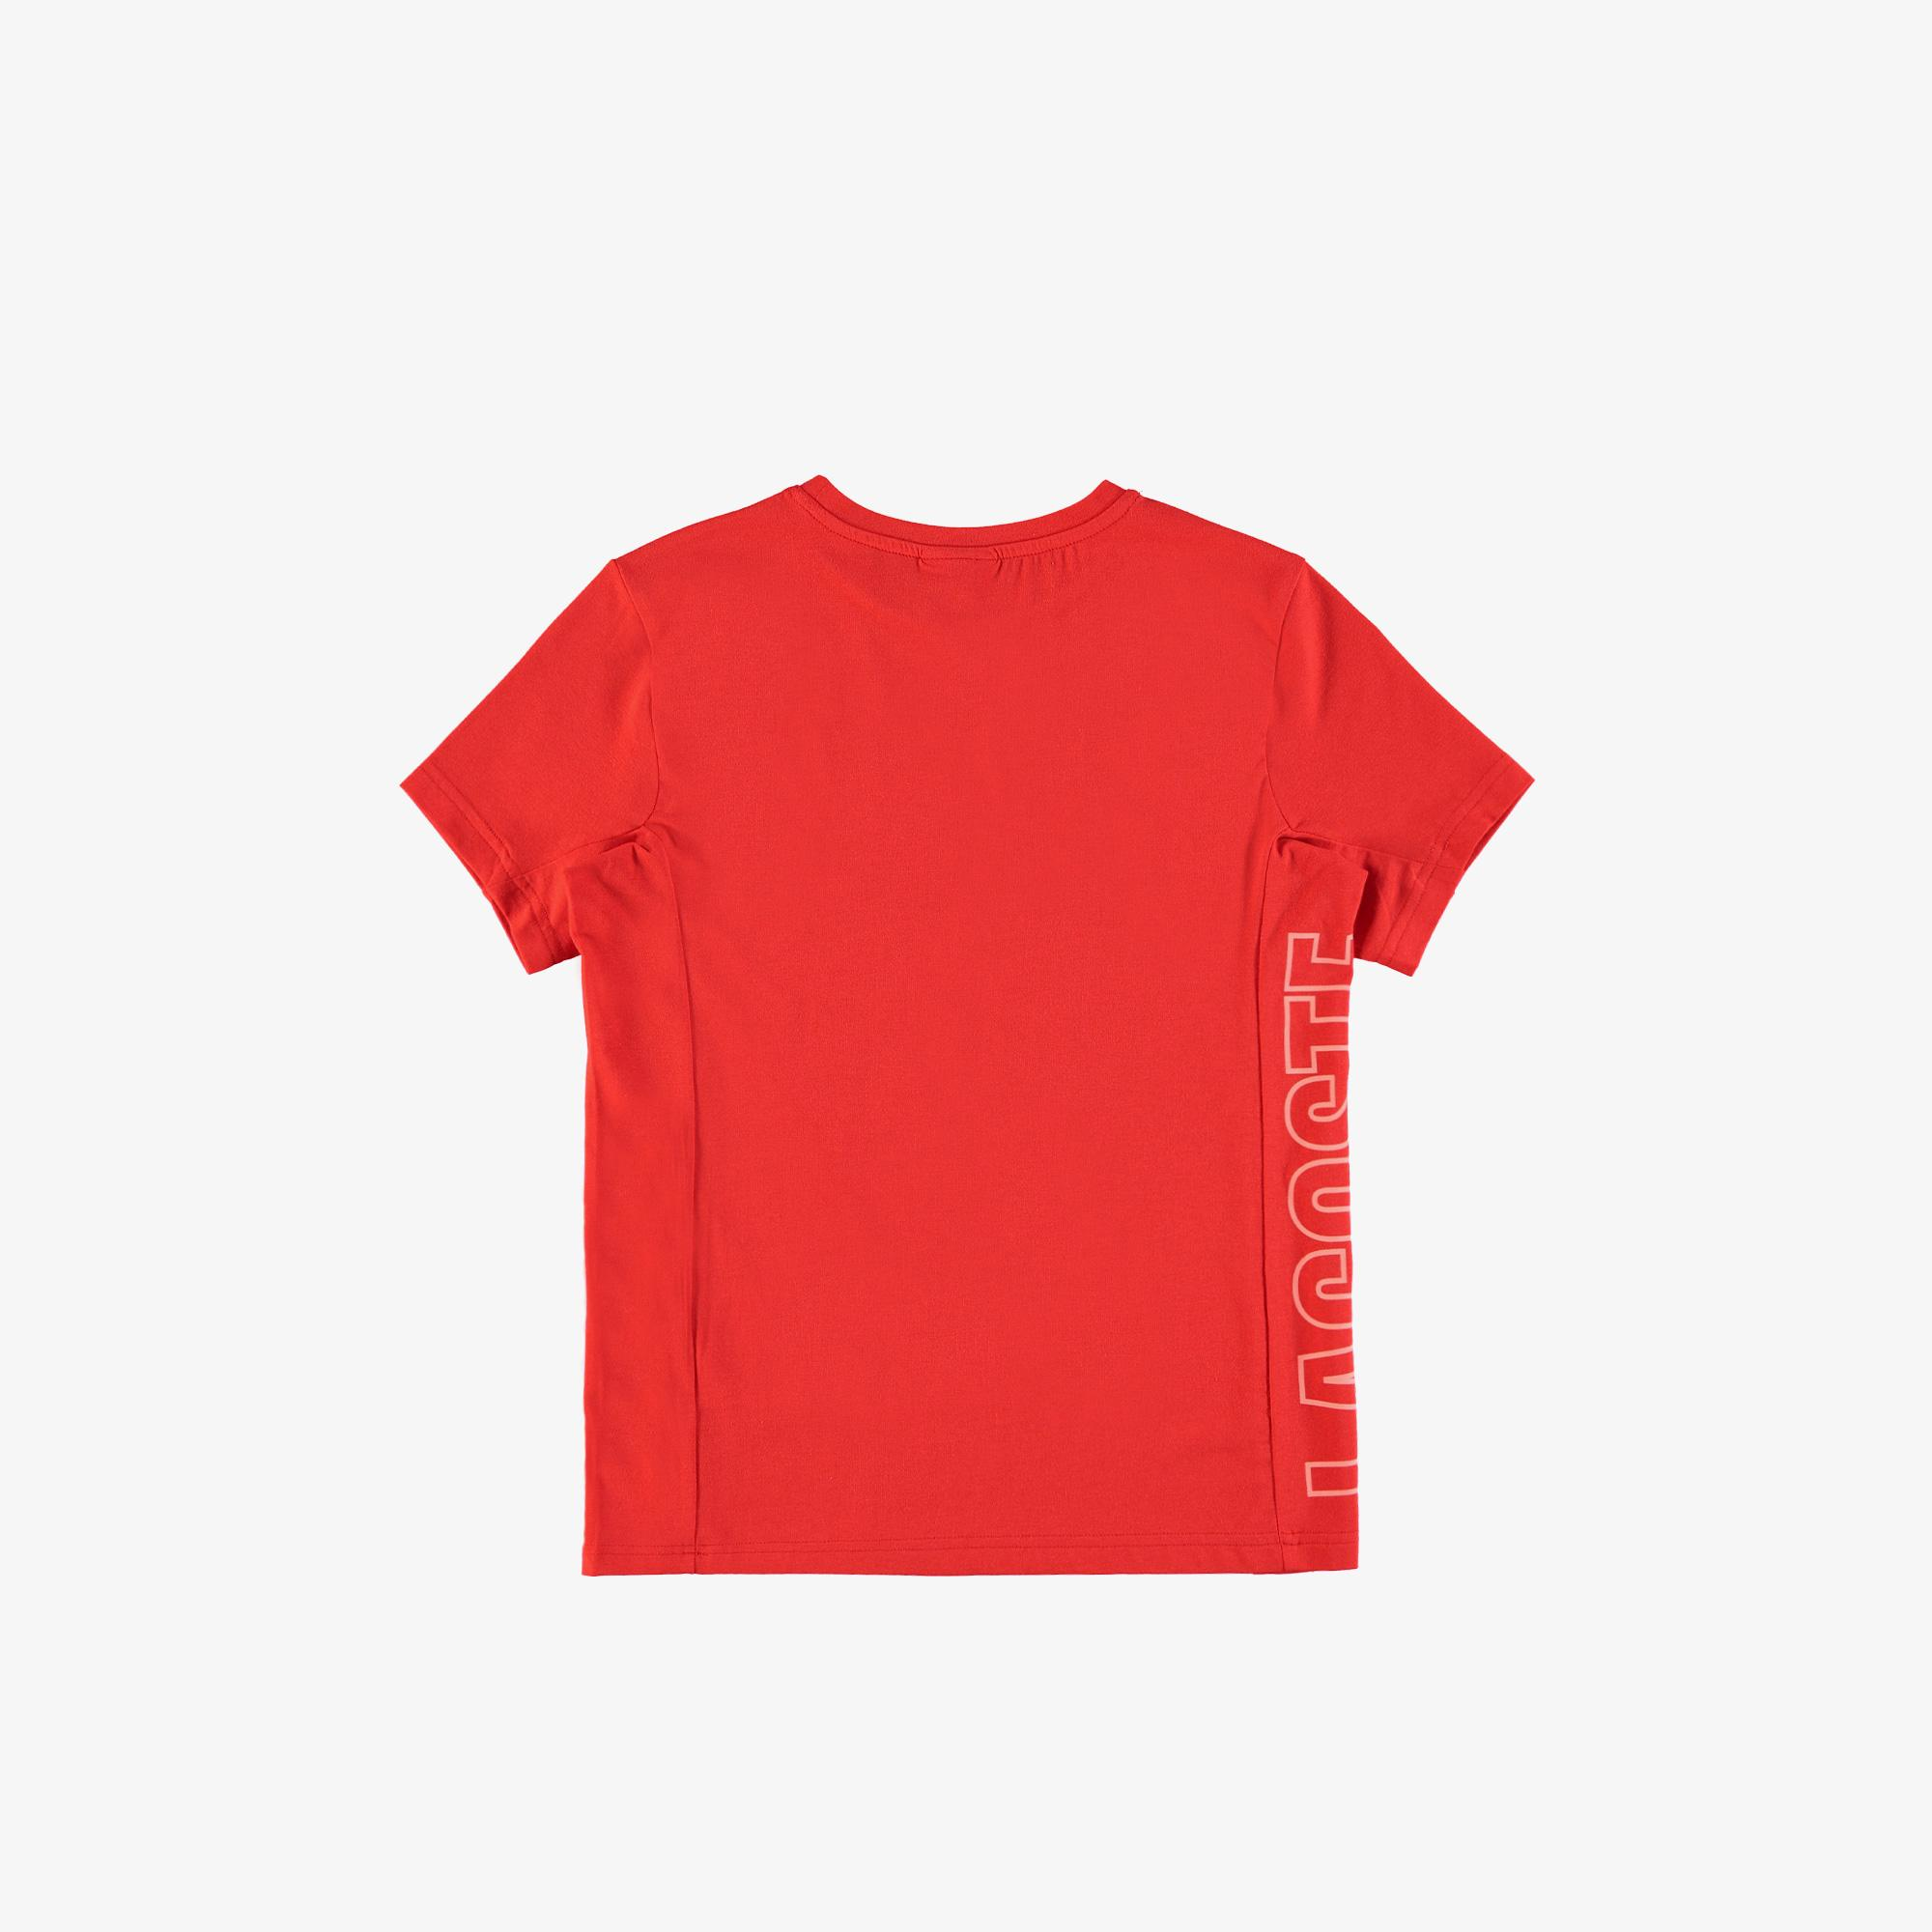 Lacoste футболка дитяча з круглим вирізом